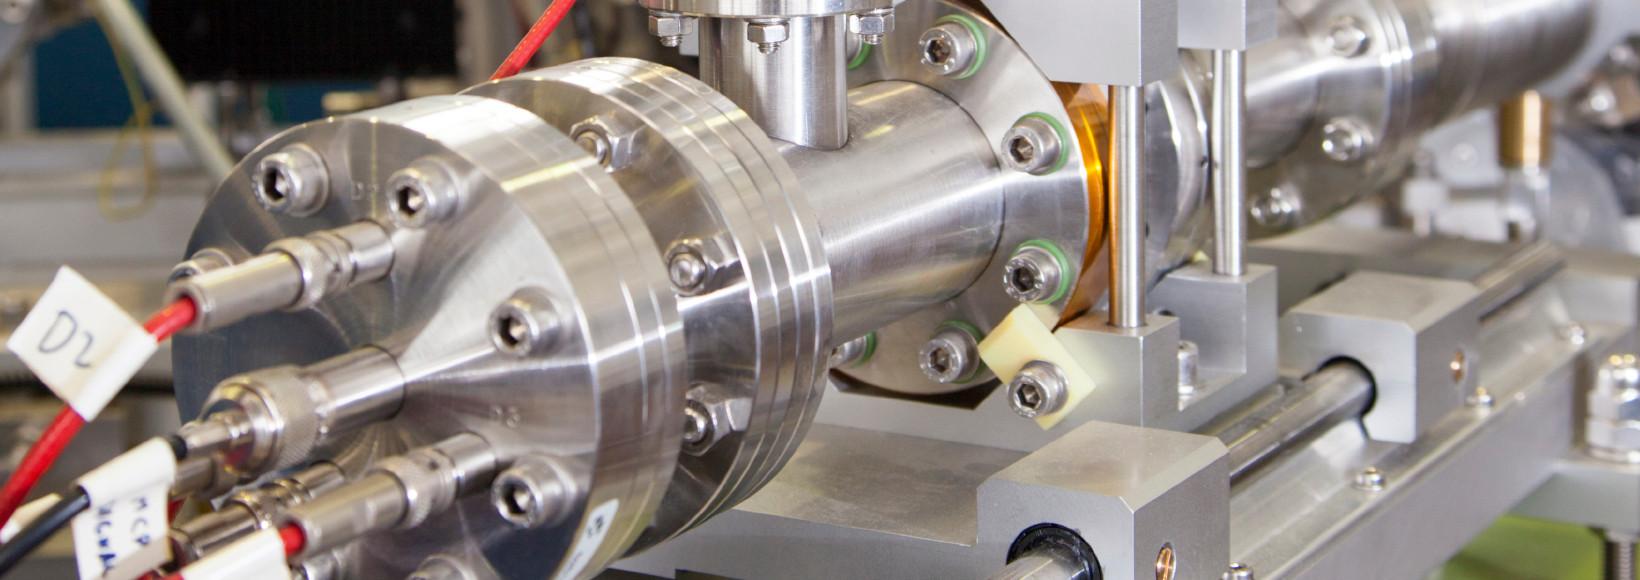 Nuclear Laboratory Equipment